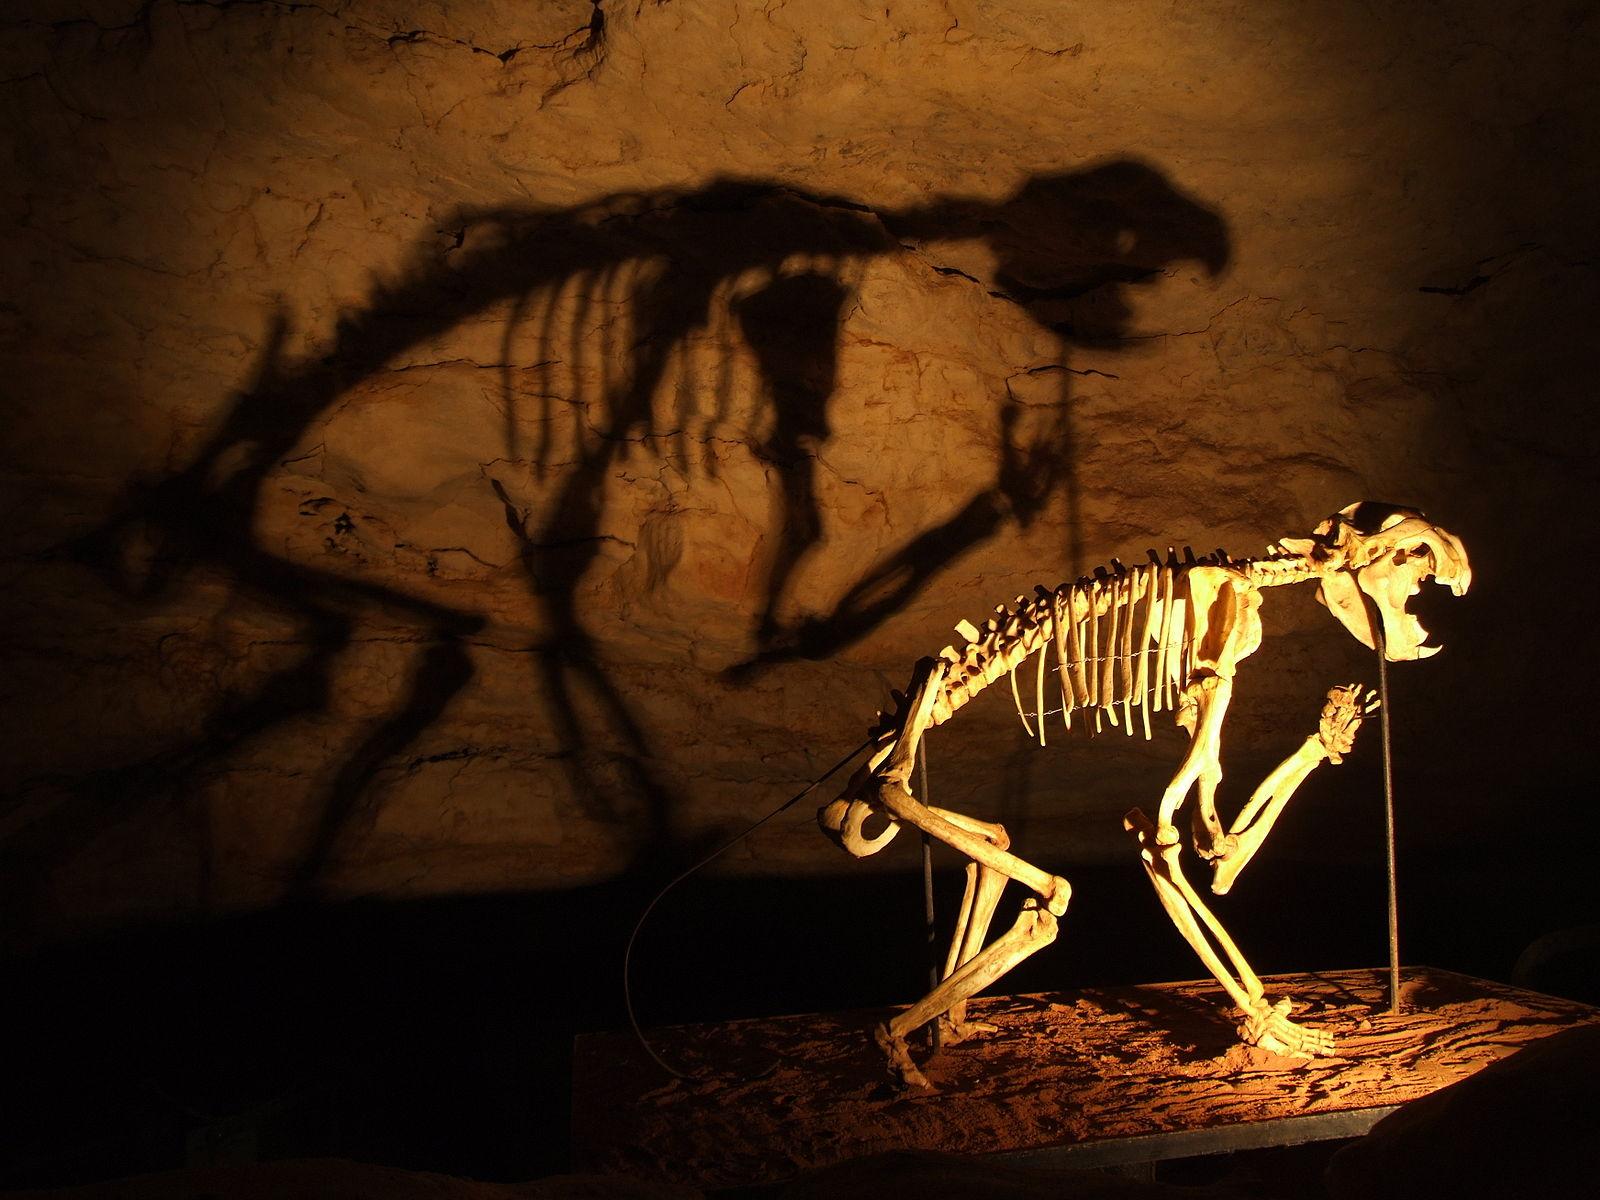 thylacoleo carnifex skeleton in the Naracoorte caves, Australia (WikiCommons)